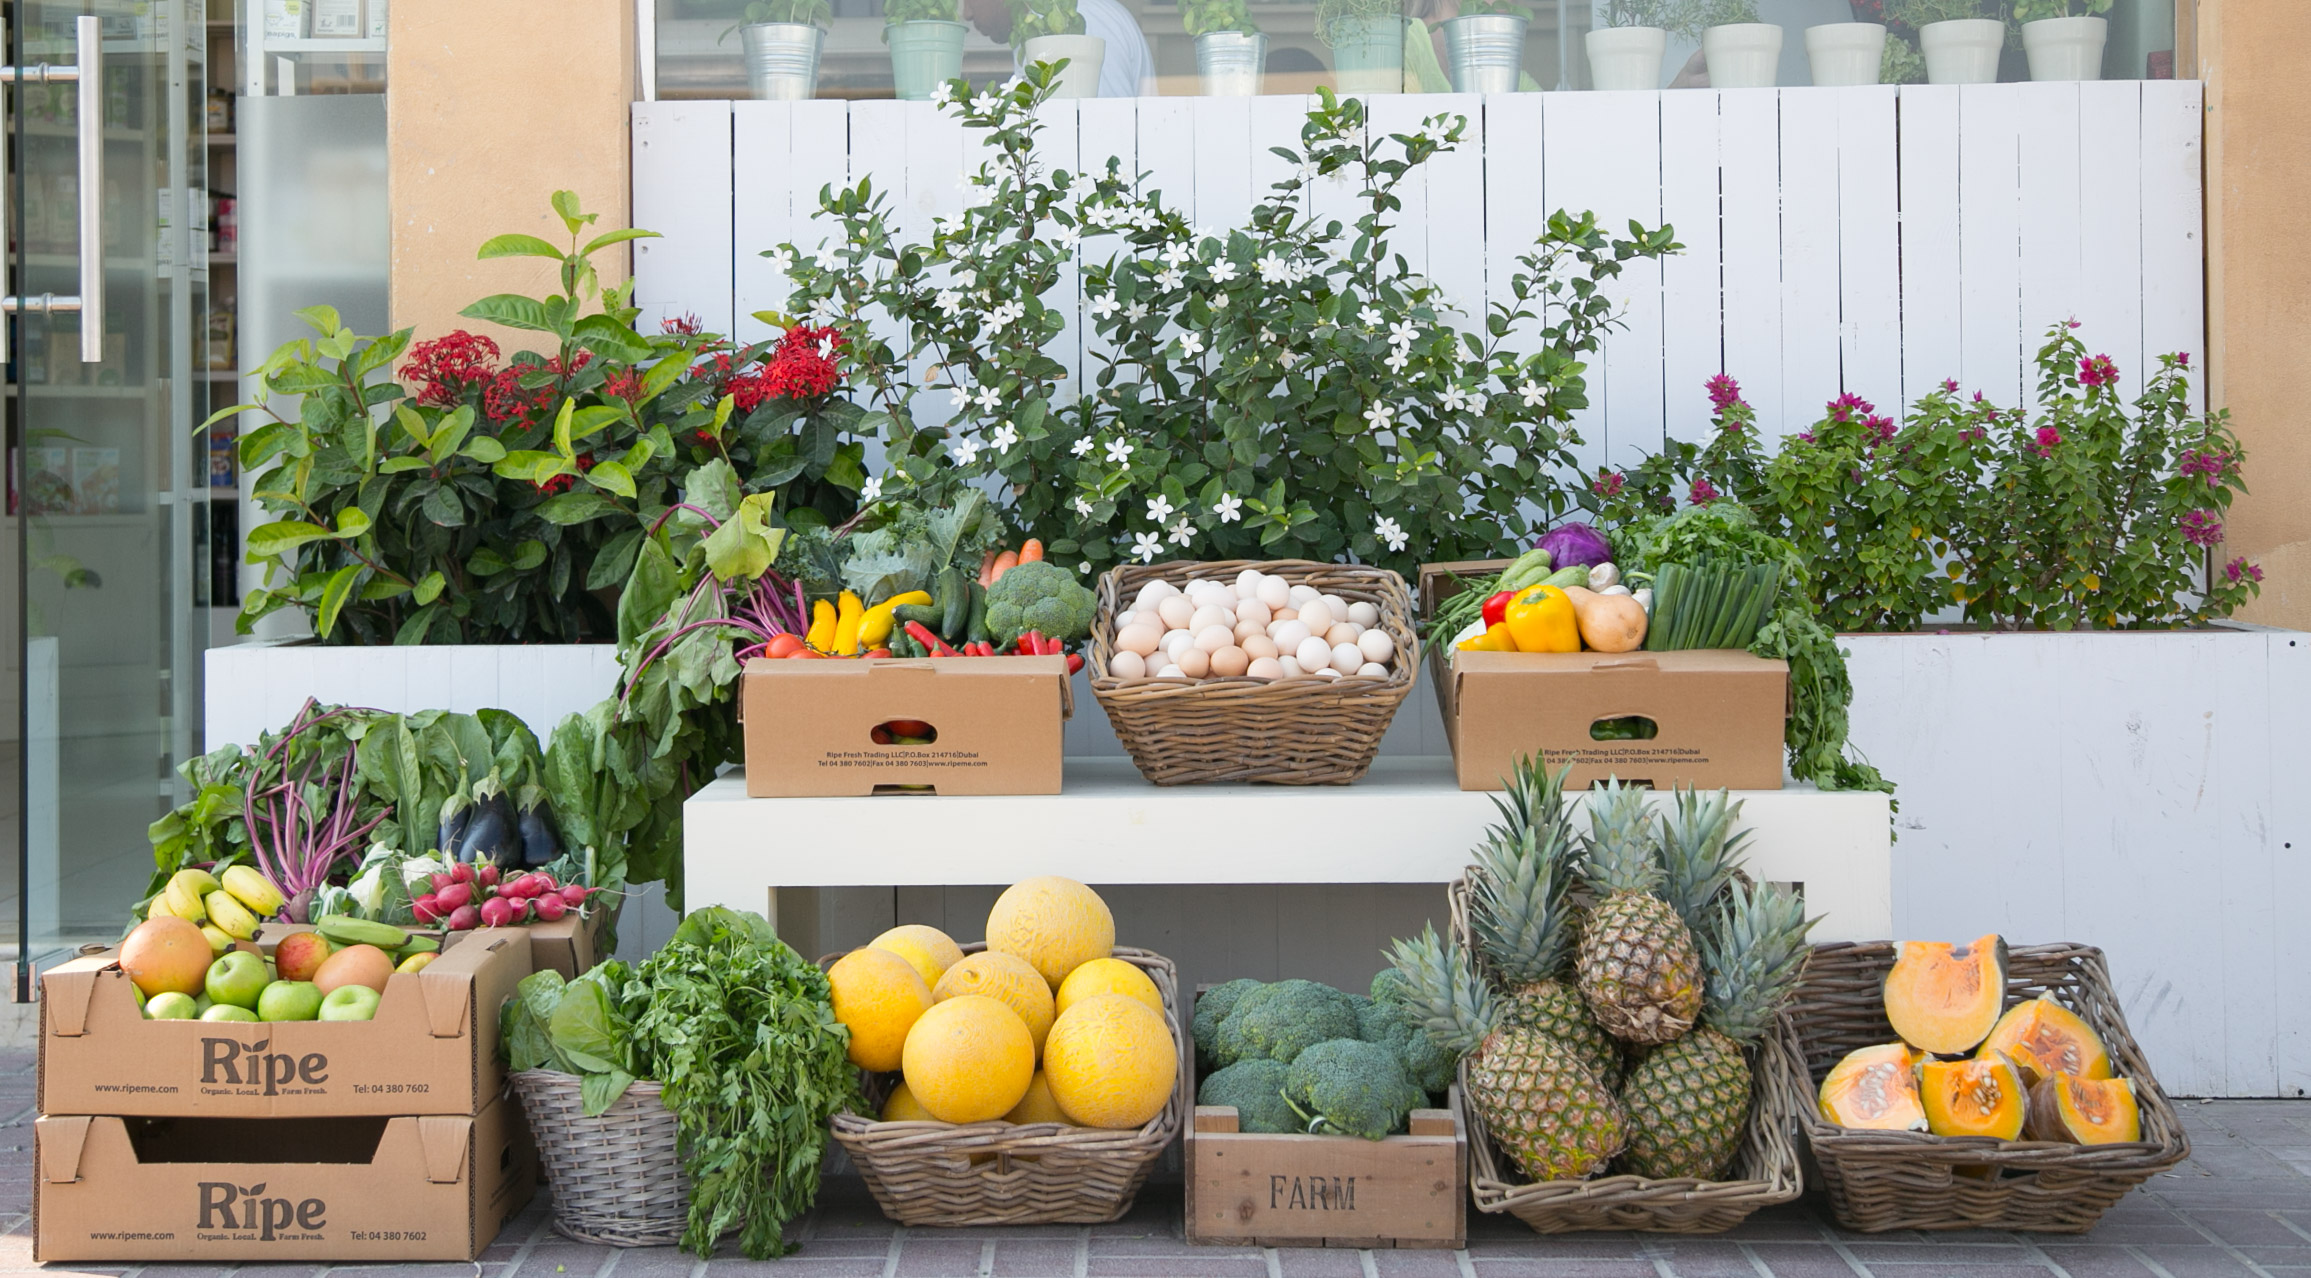 Organic Store Dubai | Farm Fresh Produce | Ripe Organic Shop